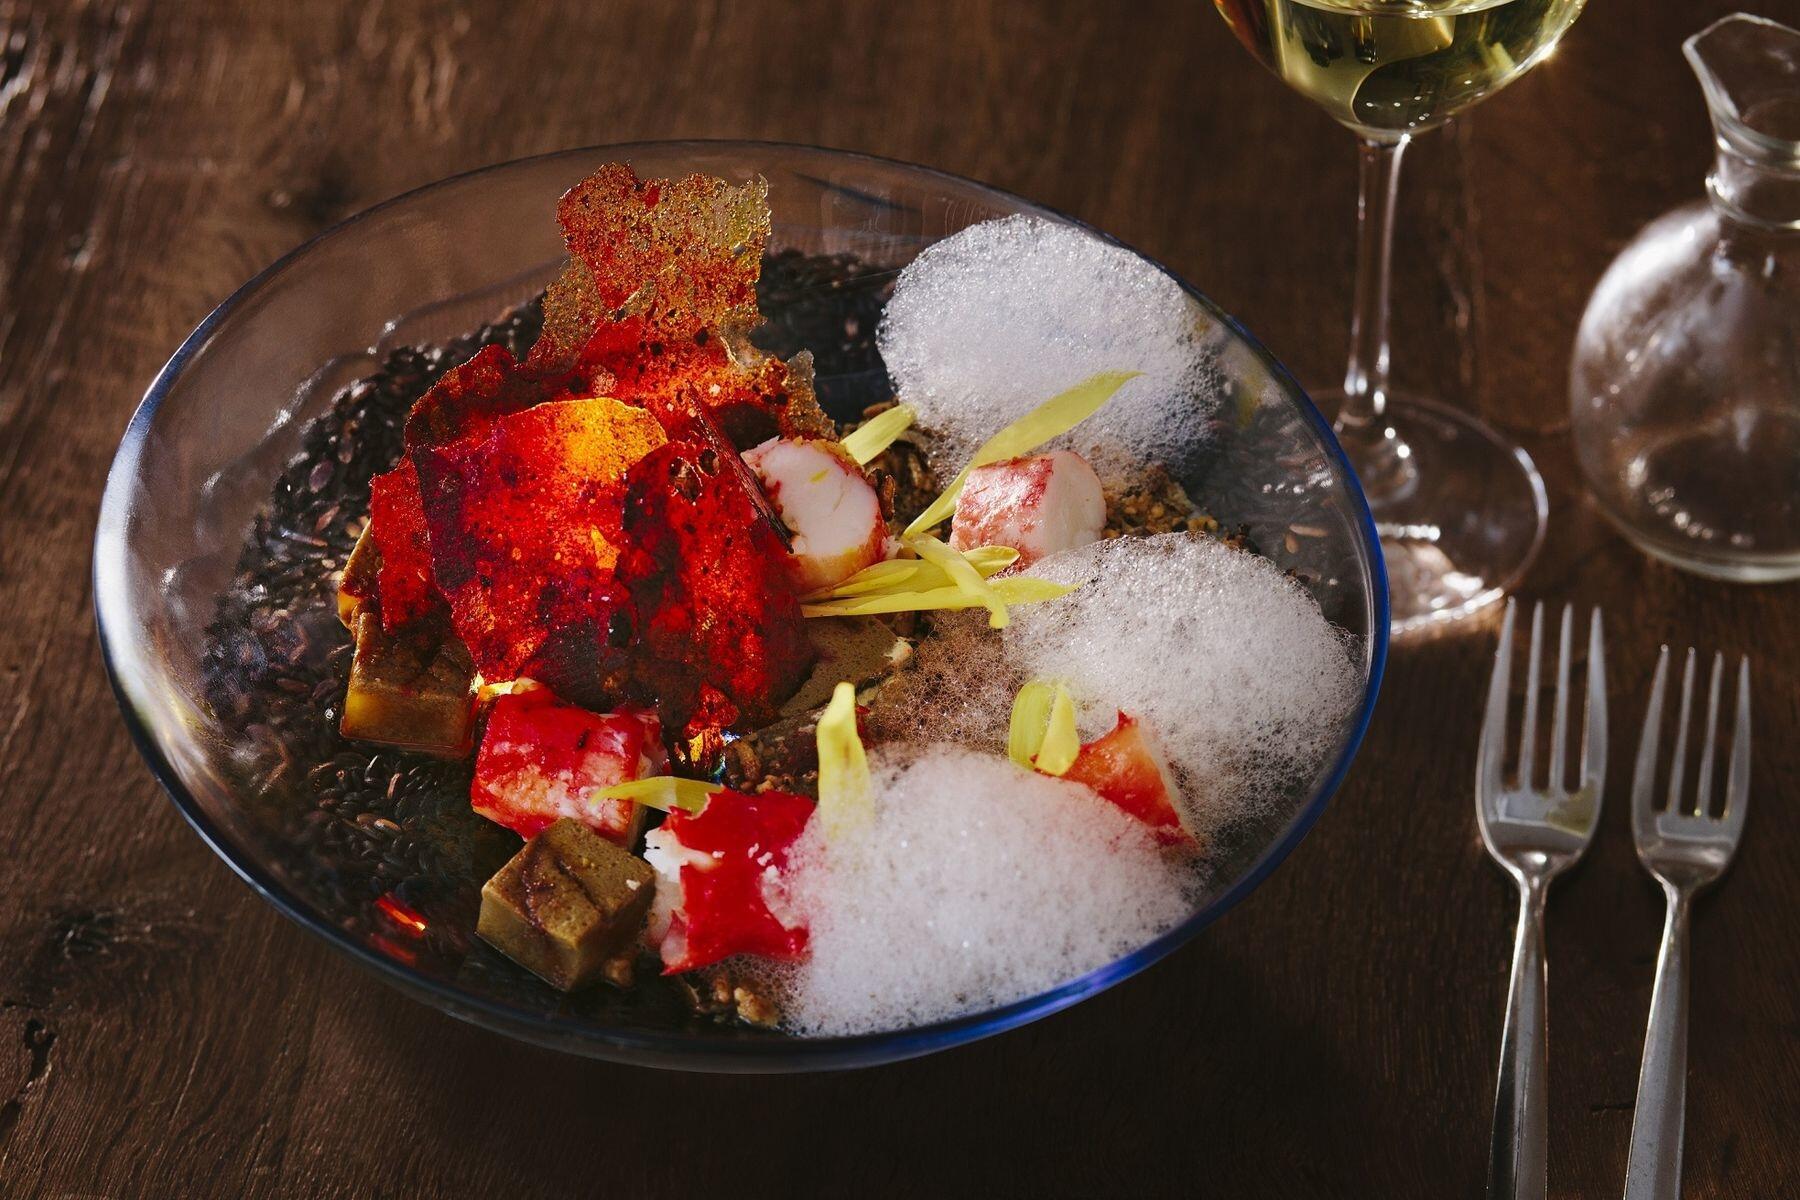 Spectacular lobster dish